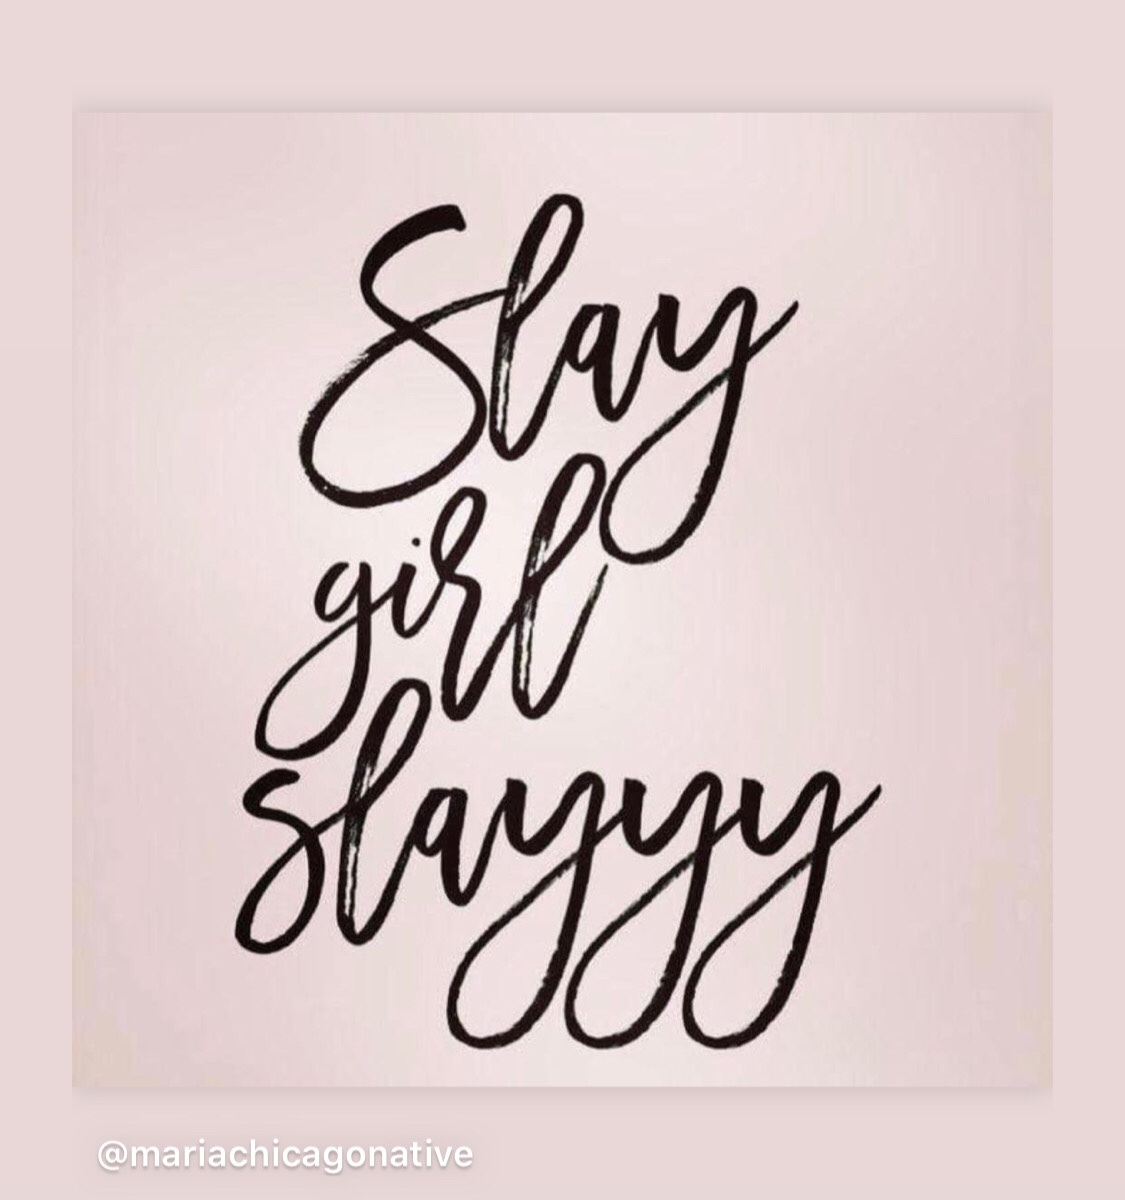 slay girl slay, winner, ceo, god, winners, earth, planets,